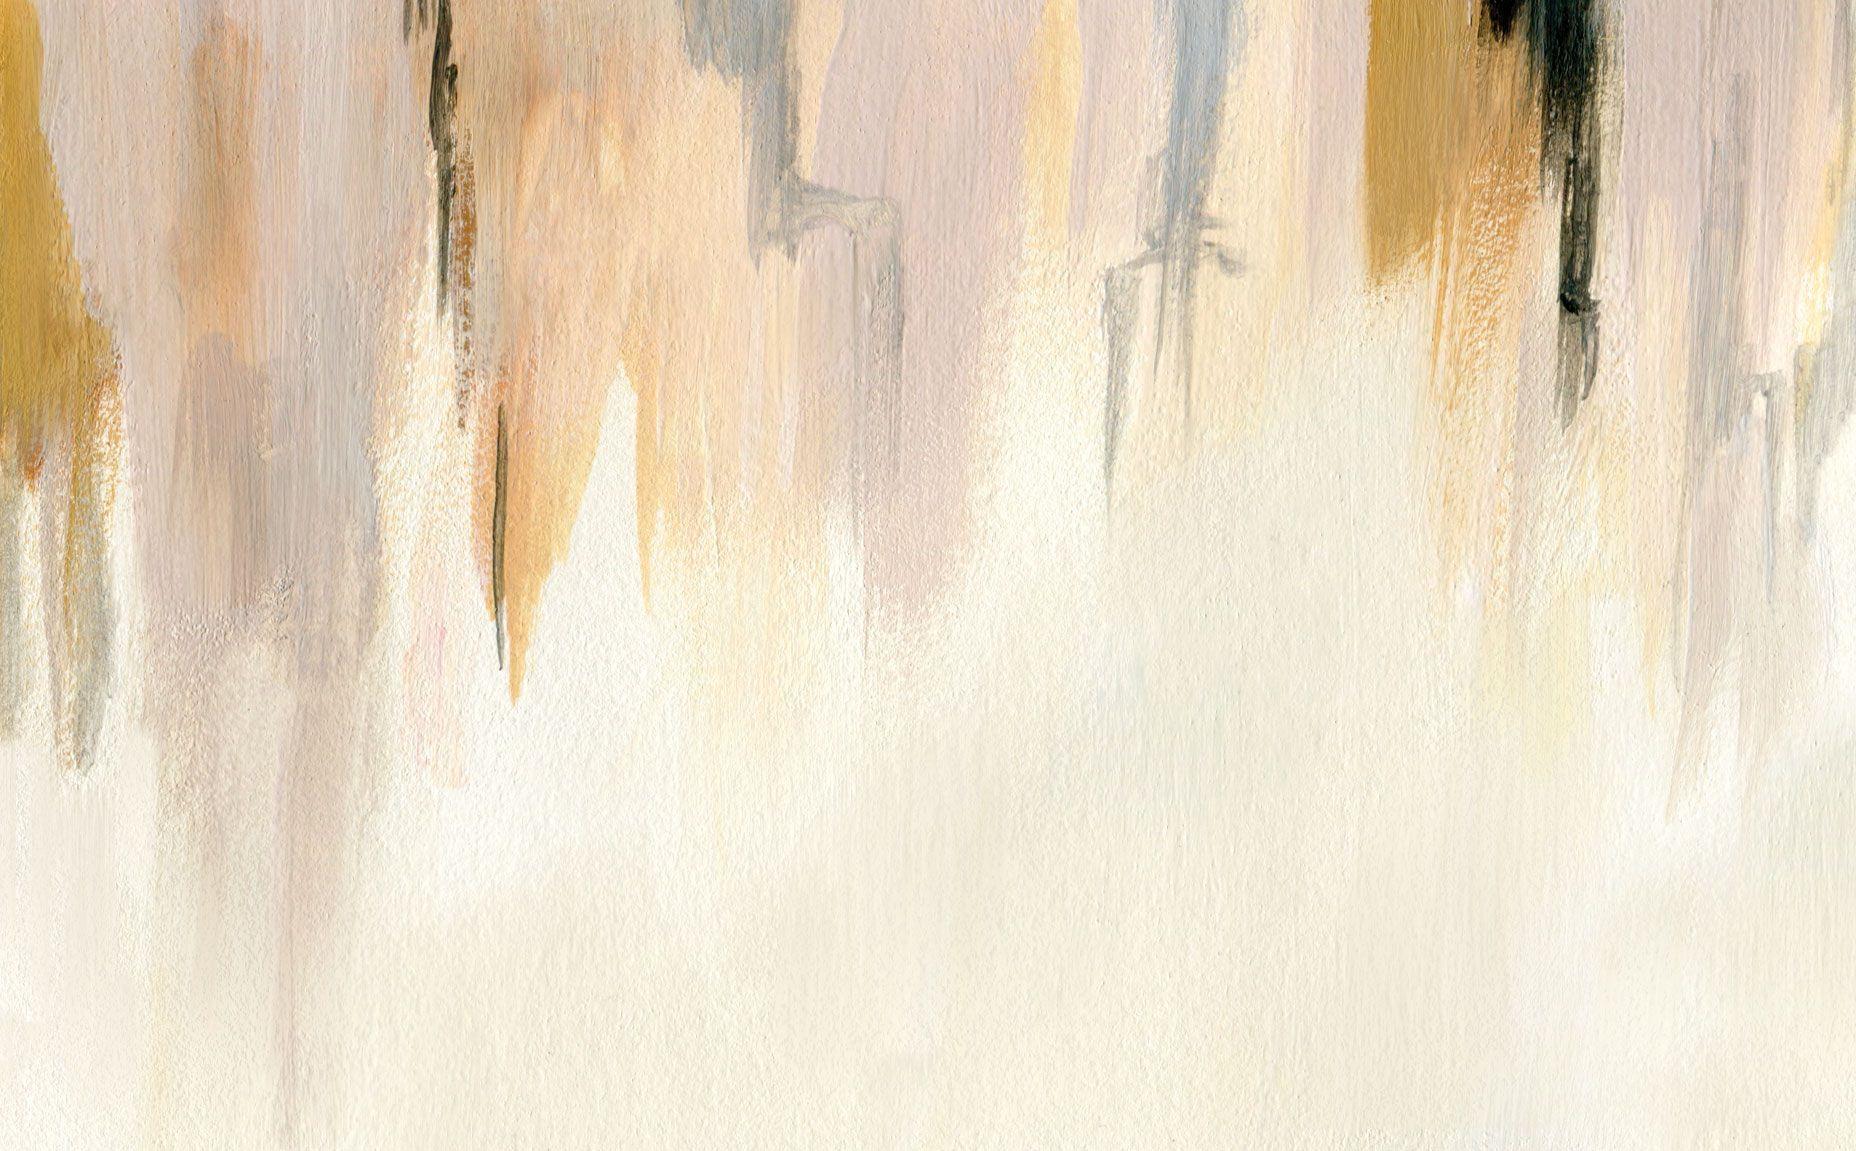 Beige Aesthetic Wallpapers On Wallpaperdog